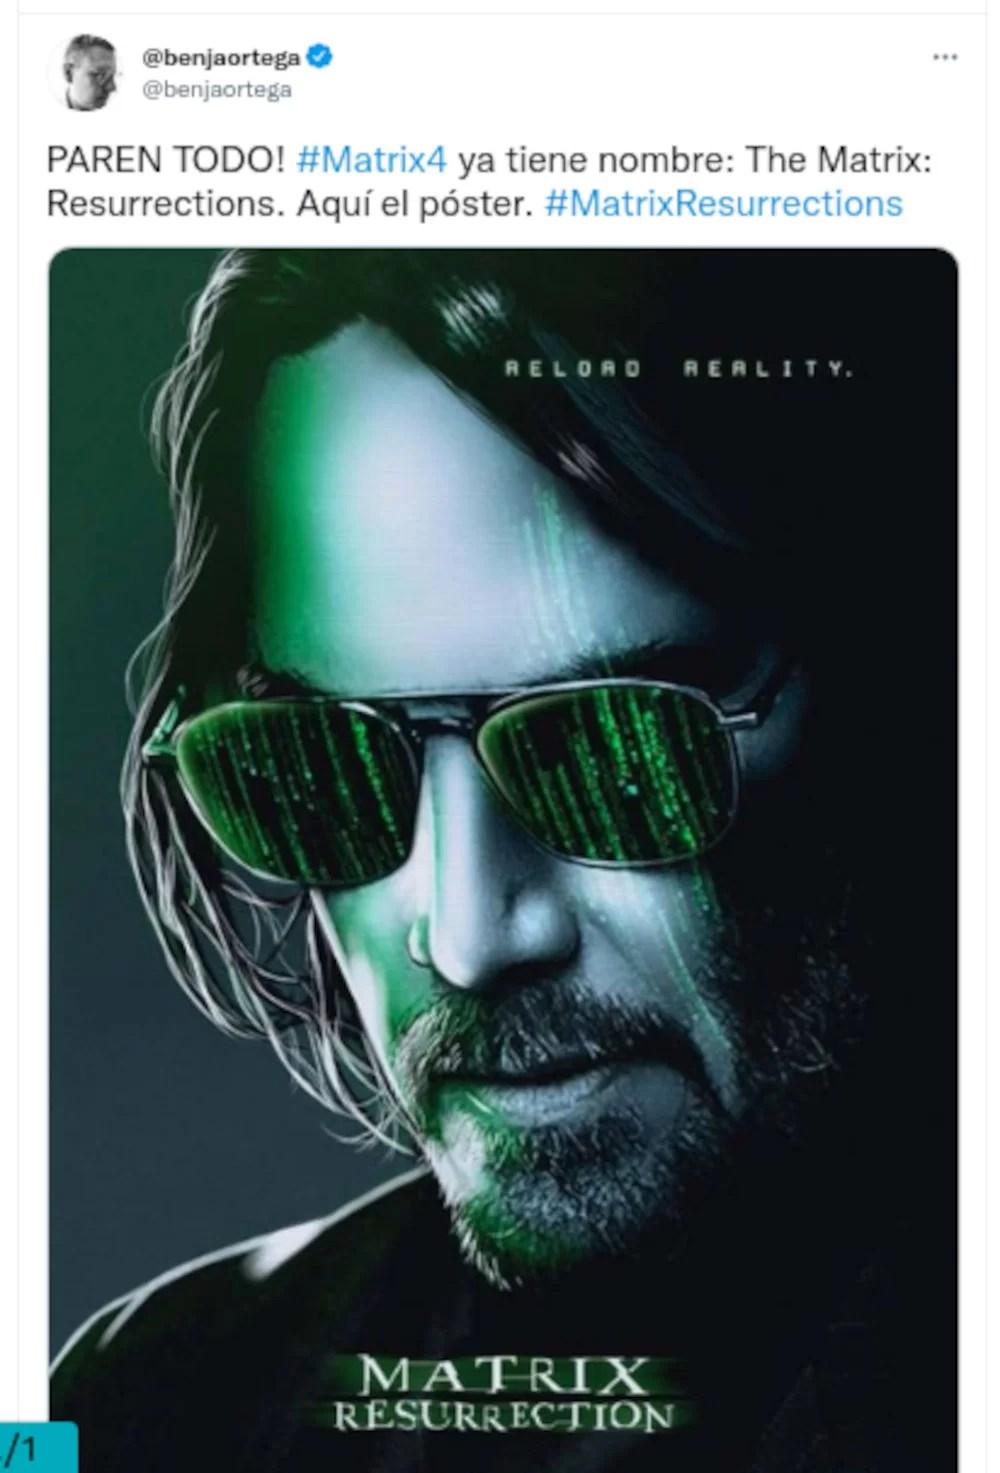 Matrix 4 has a name, date and description of its advance